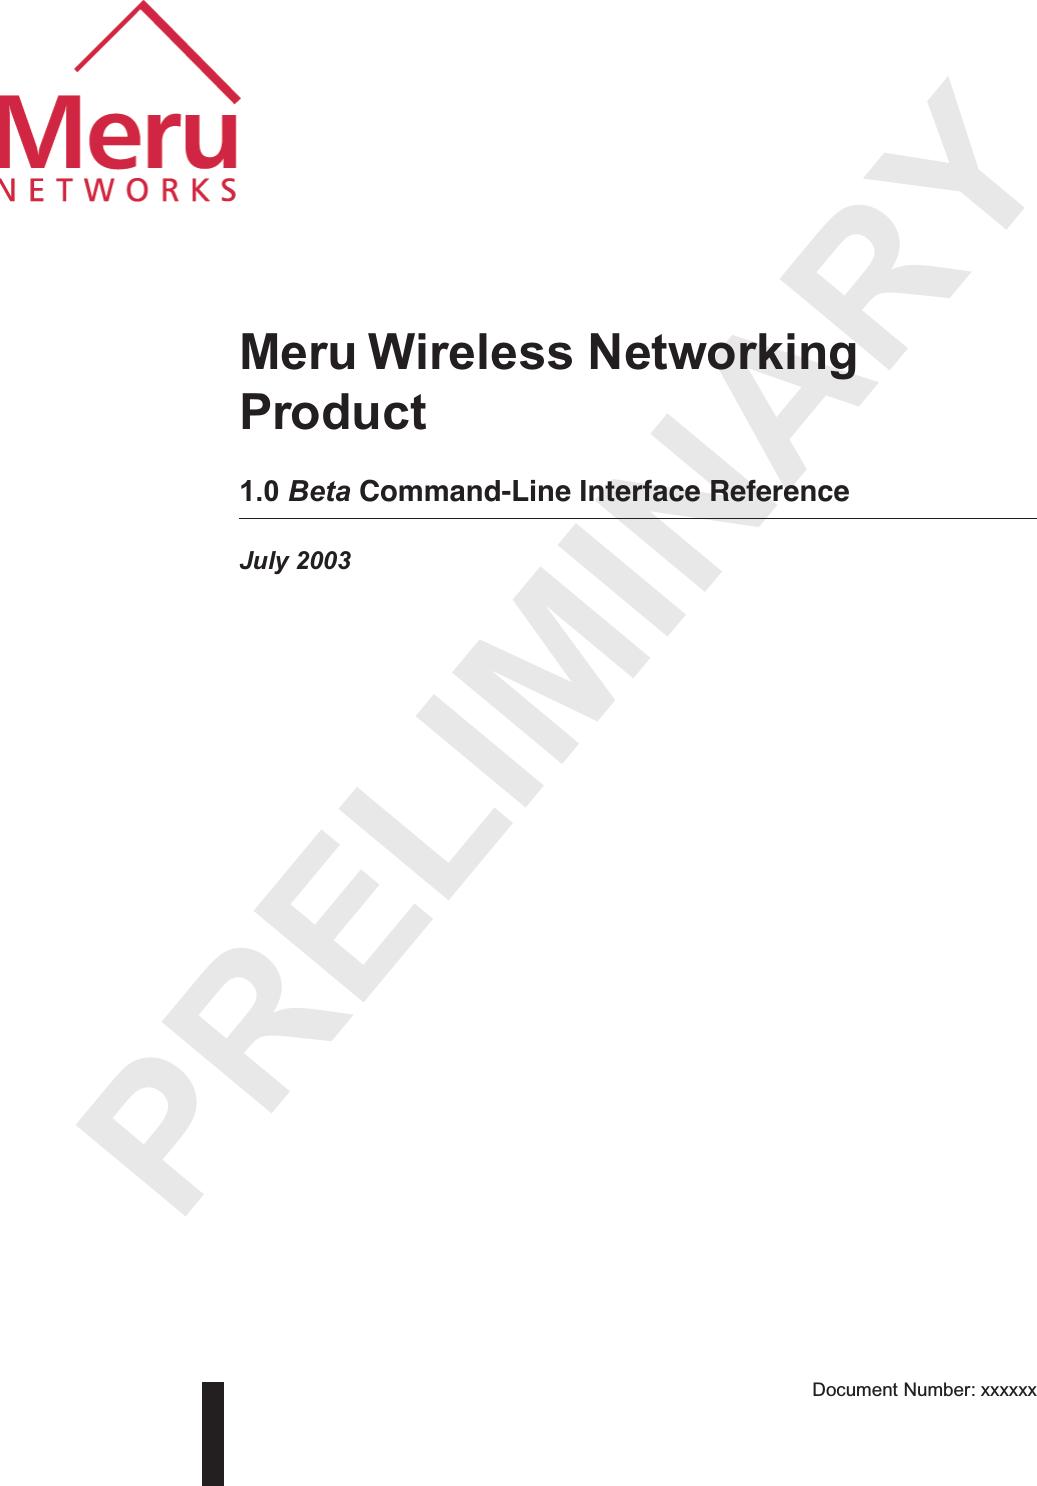 Meru Networks AP100 802.11b Access Point User Manual CLIref BK